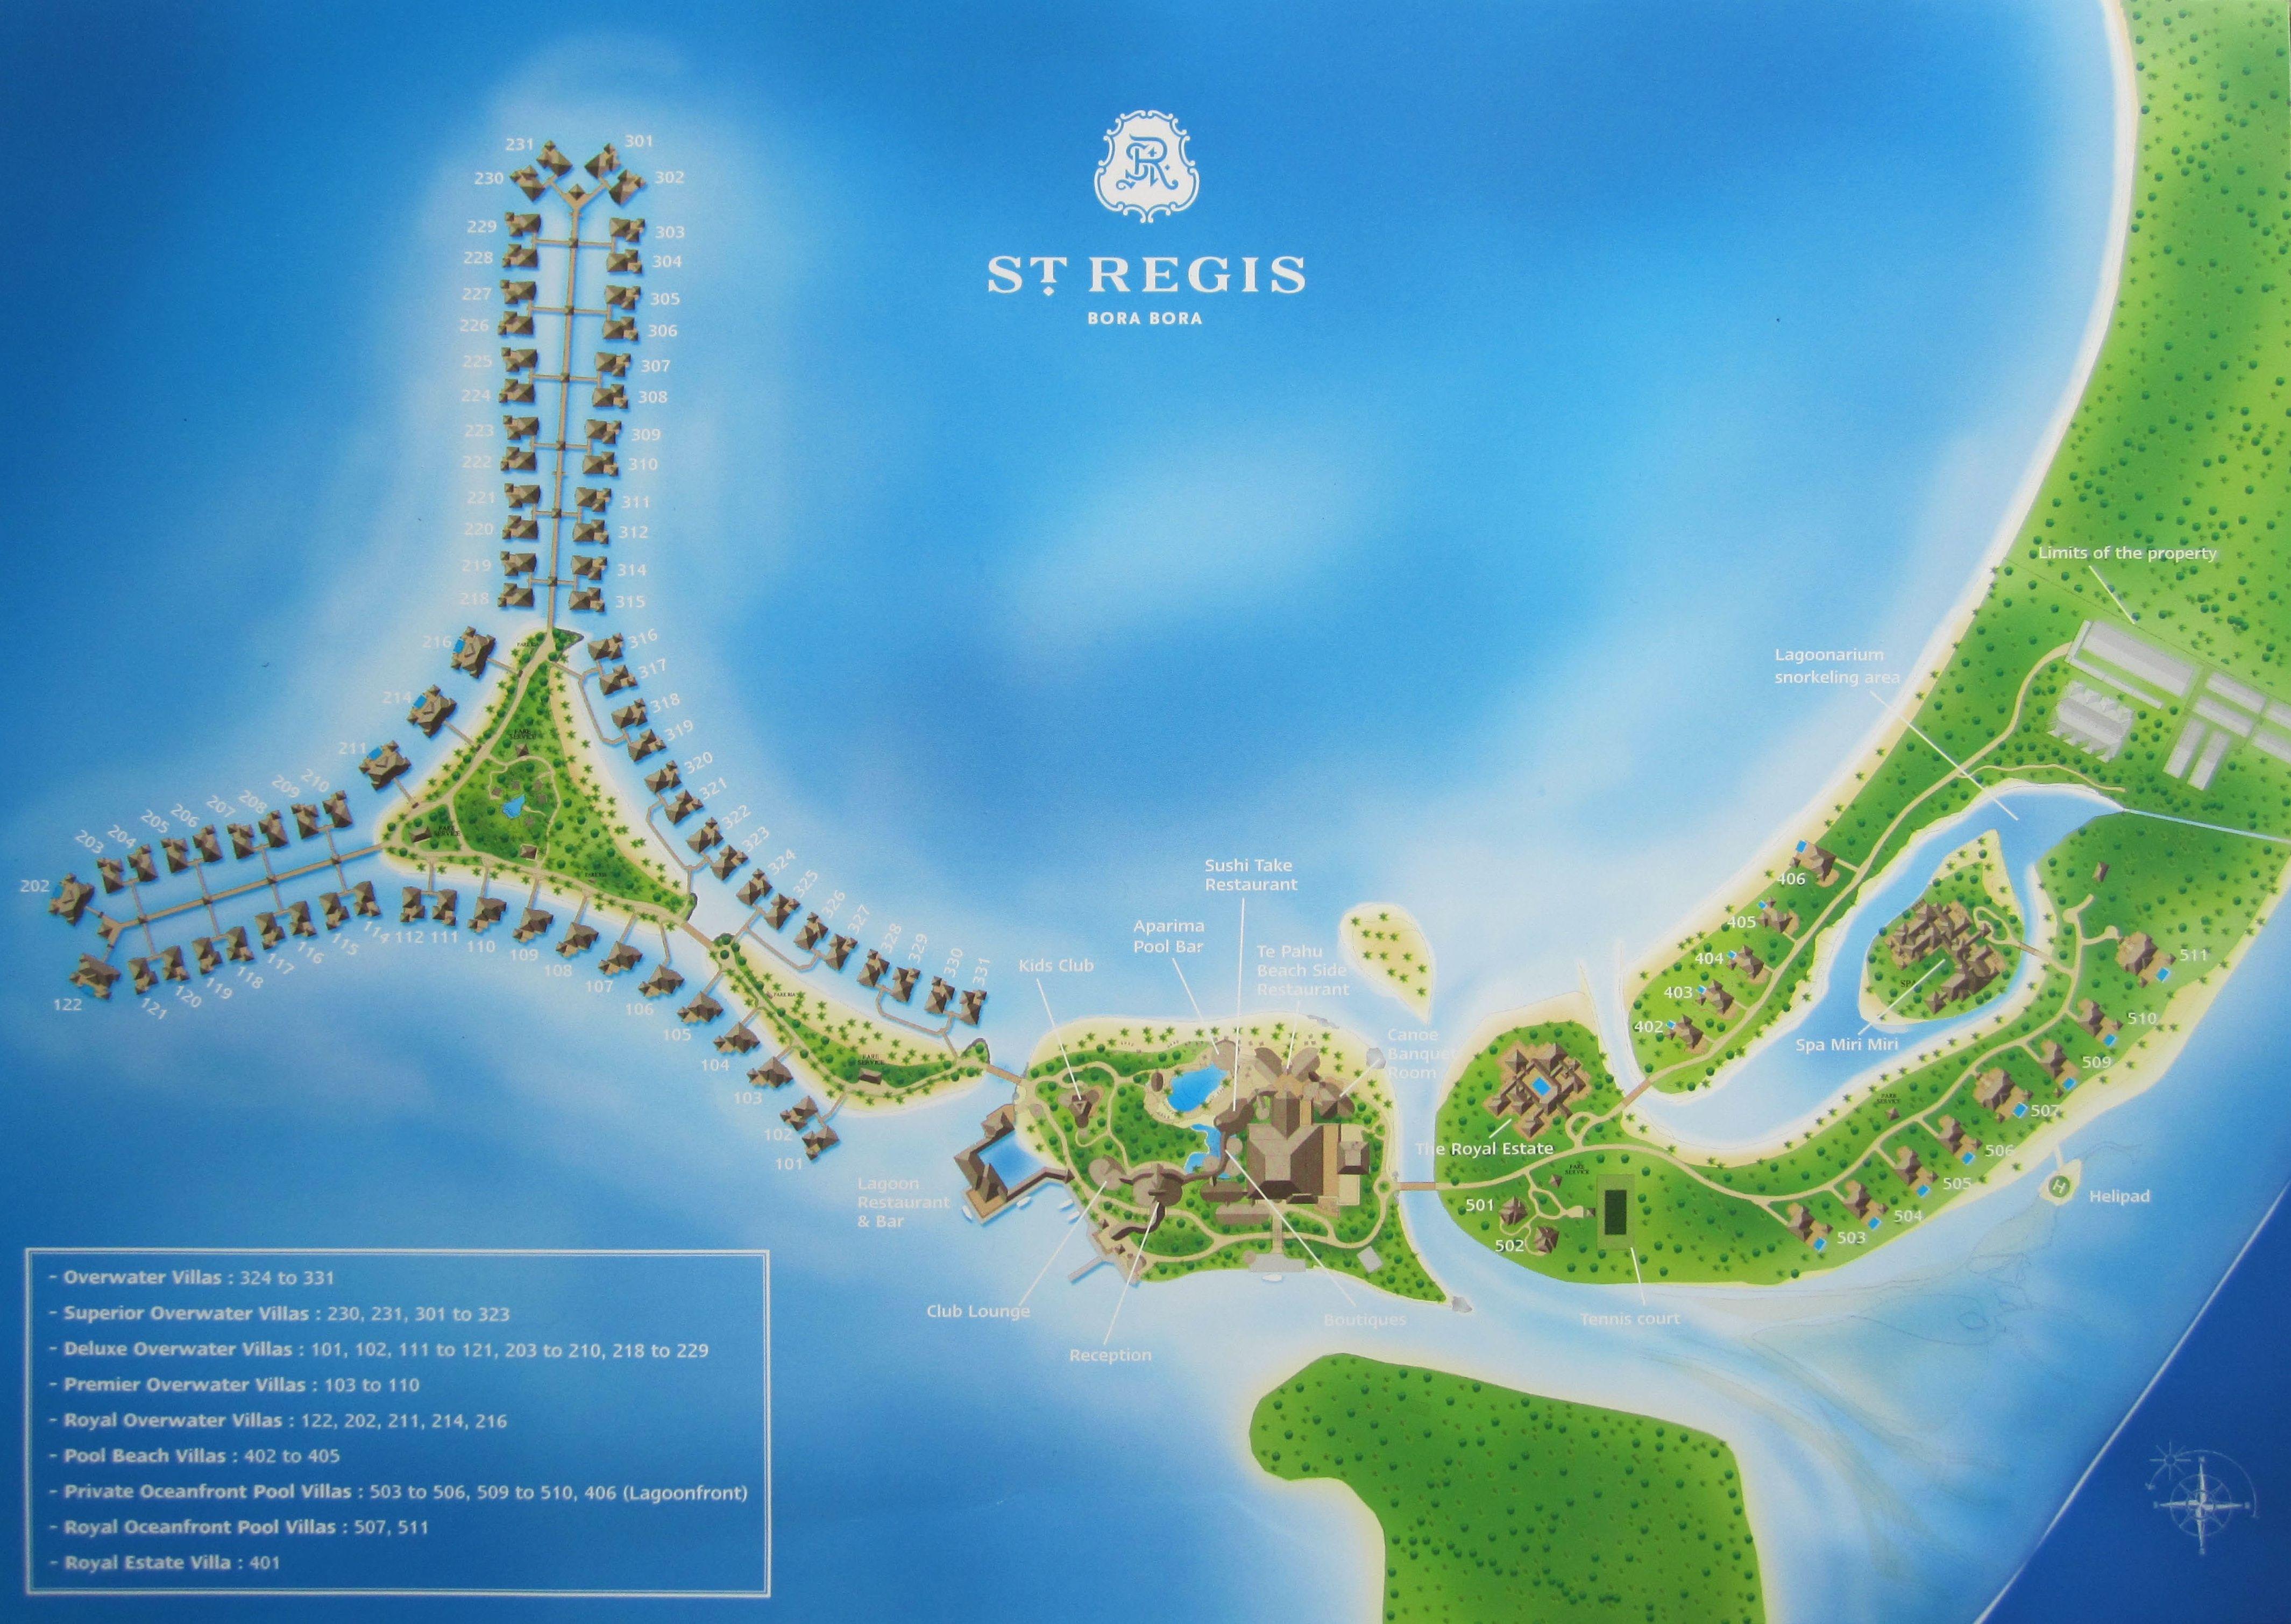 The St Regis Bora Bora Resort Map Bora Bora Resorts